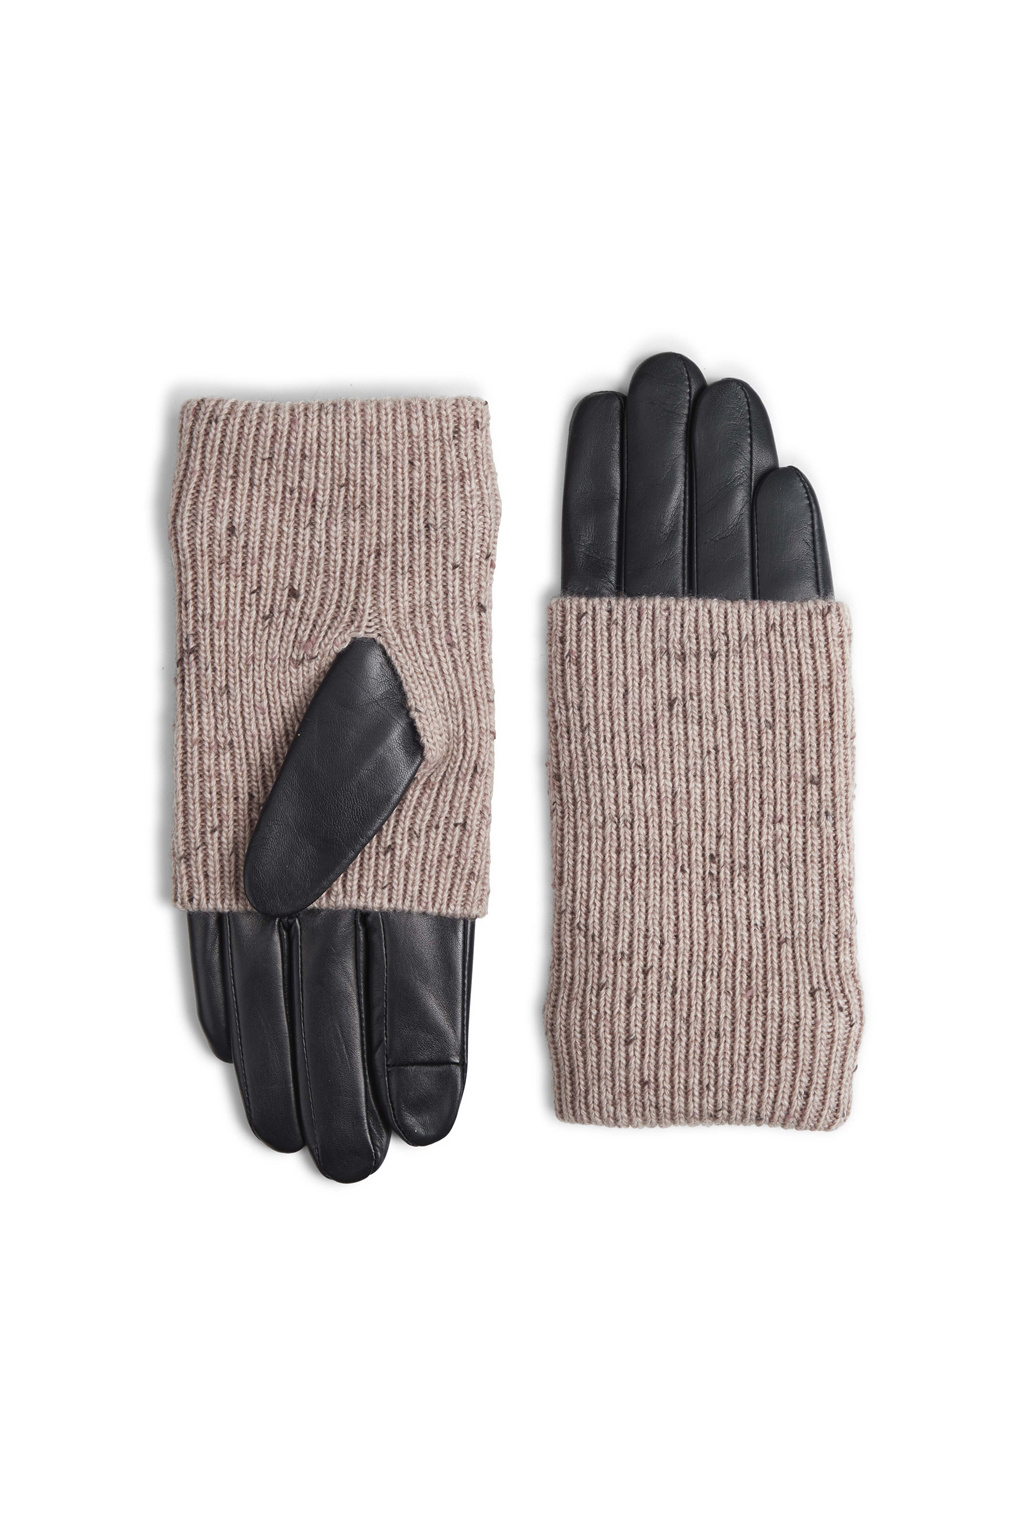 Helly Glove - Black w/ Mix Earth-2